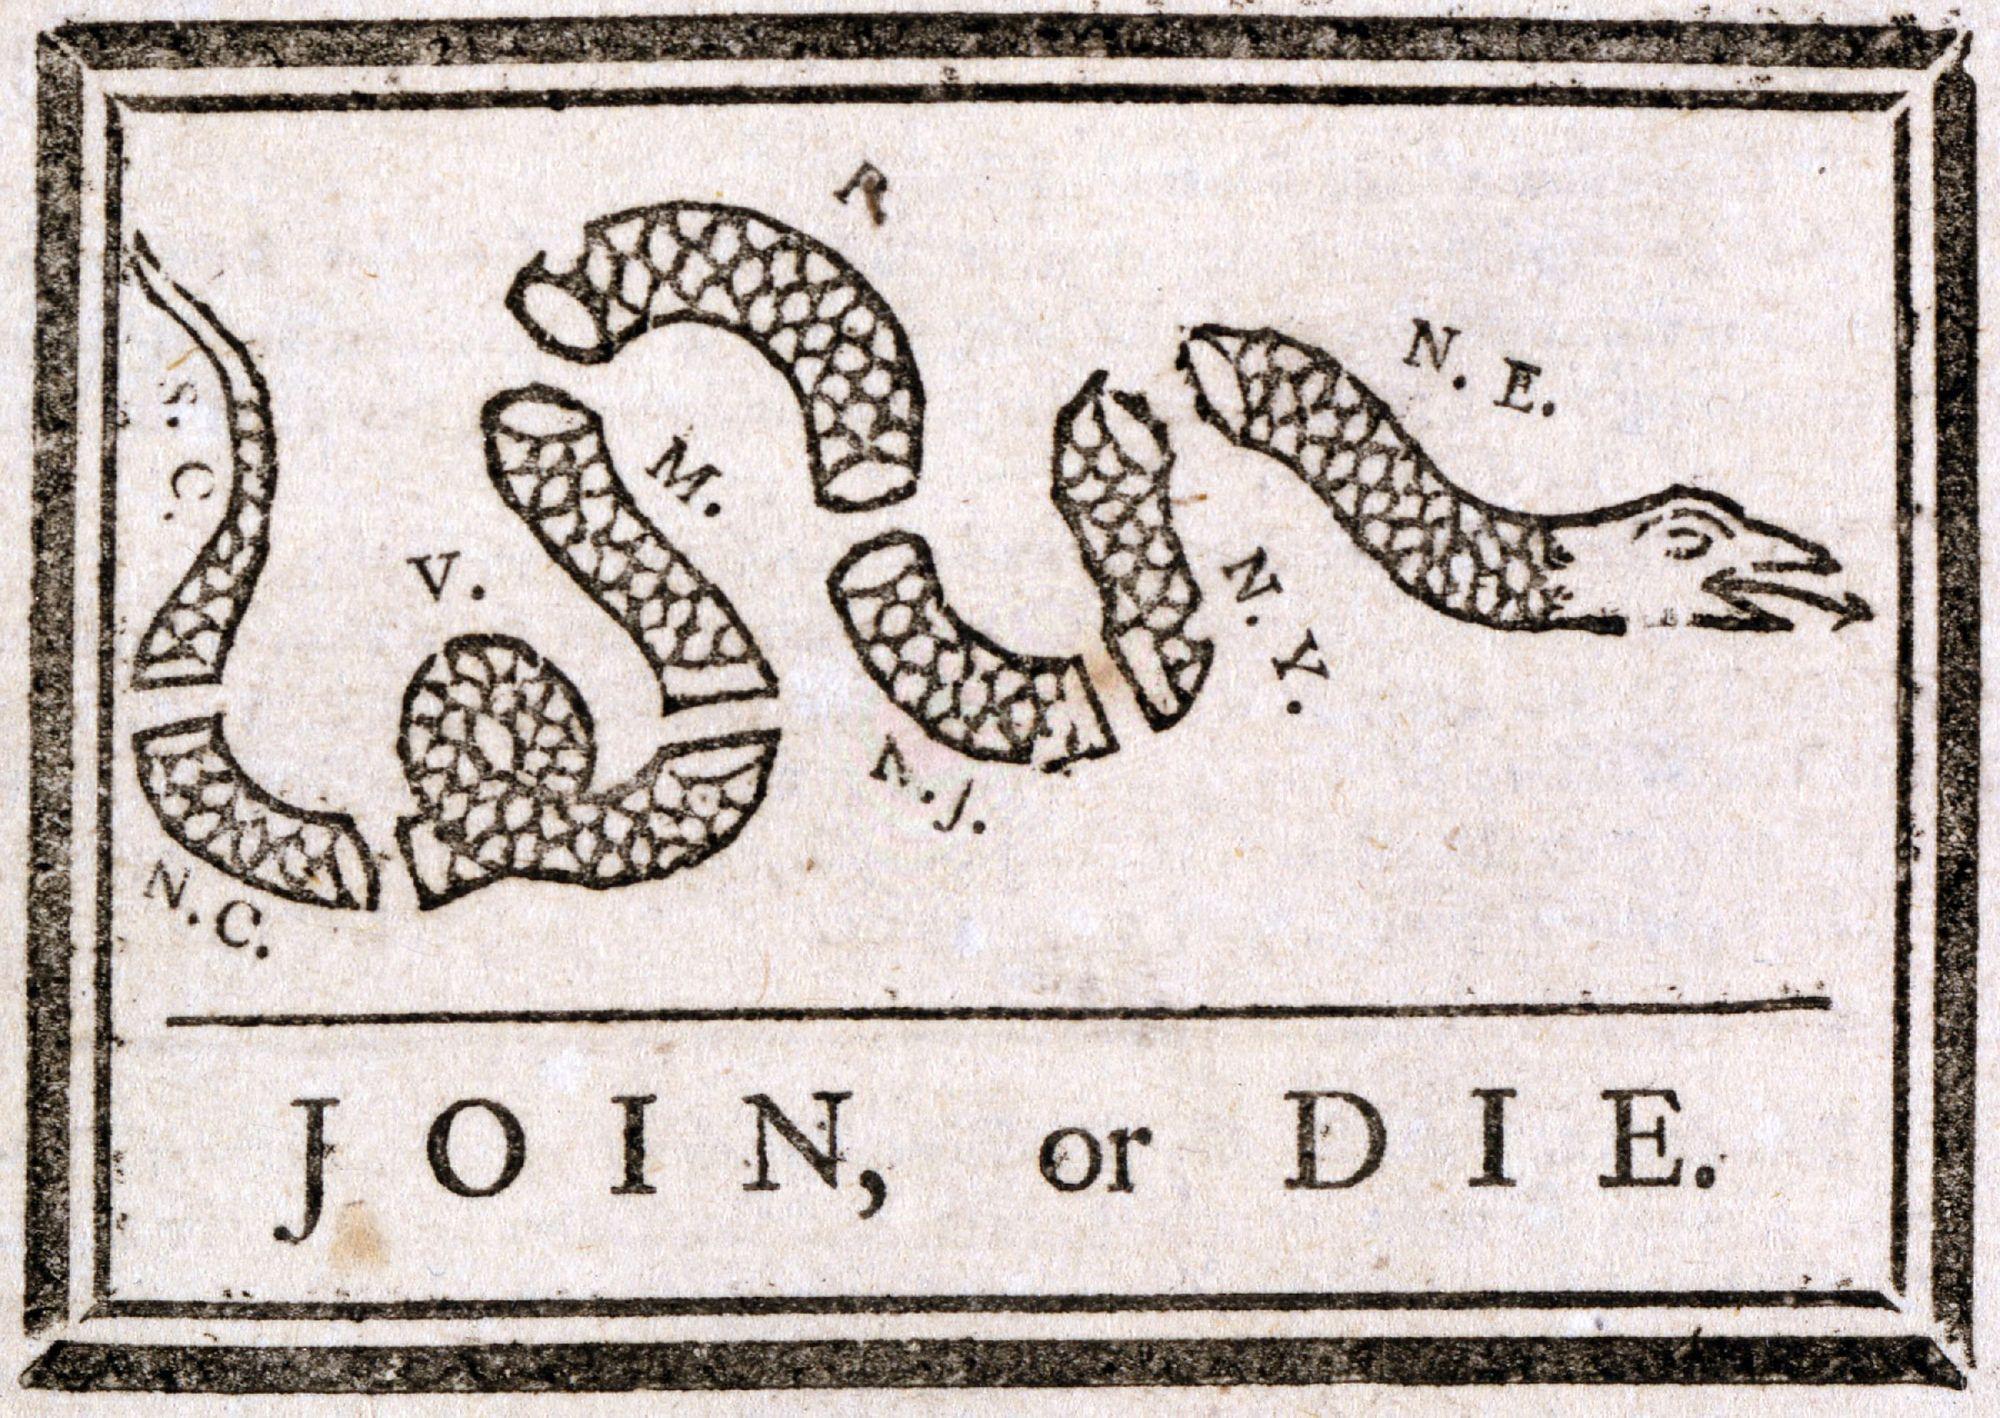 Join or Die, Pennsylvania Gazette, circa 1754